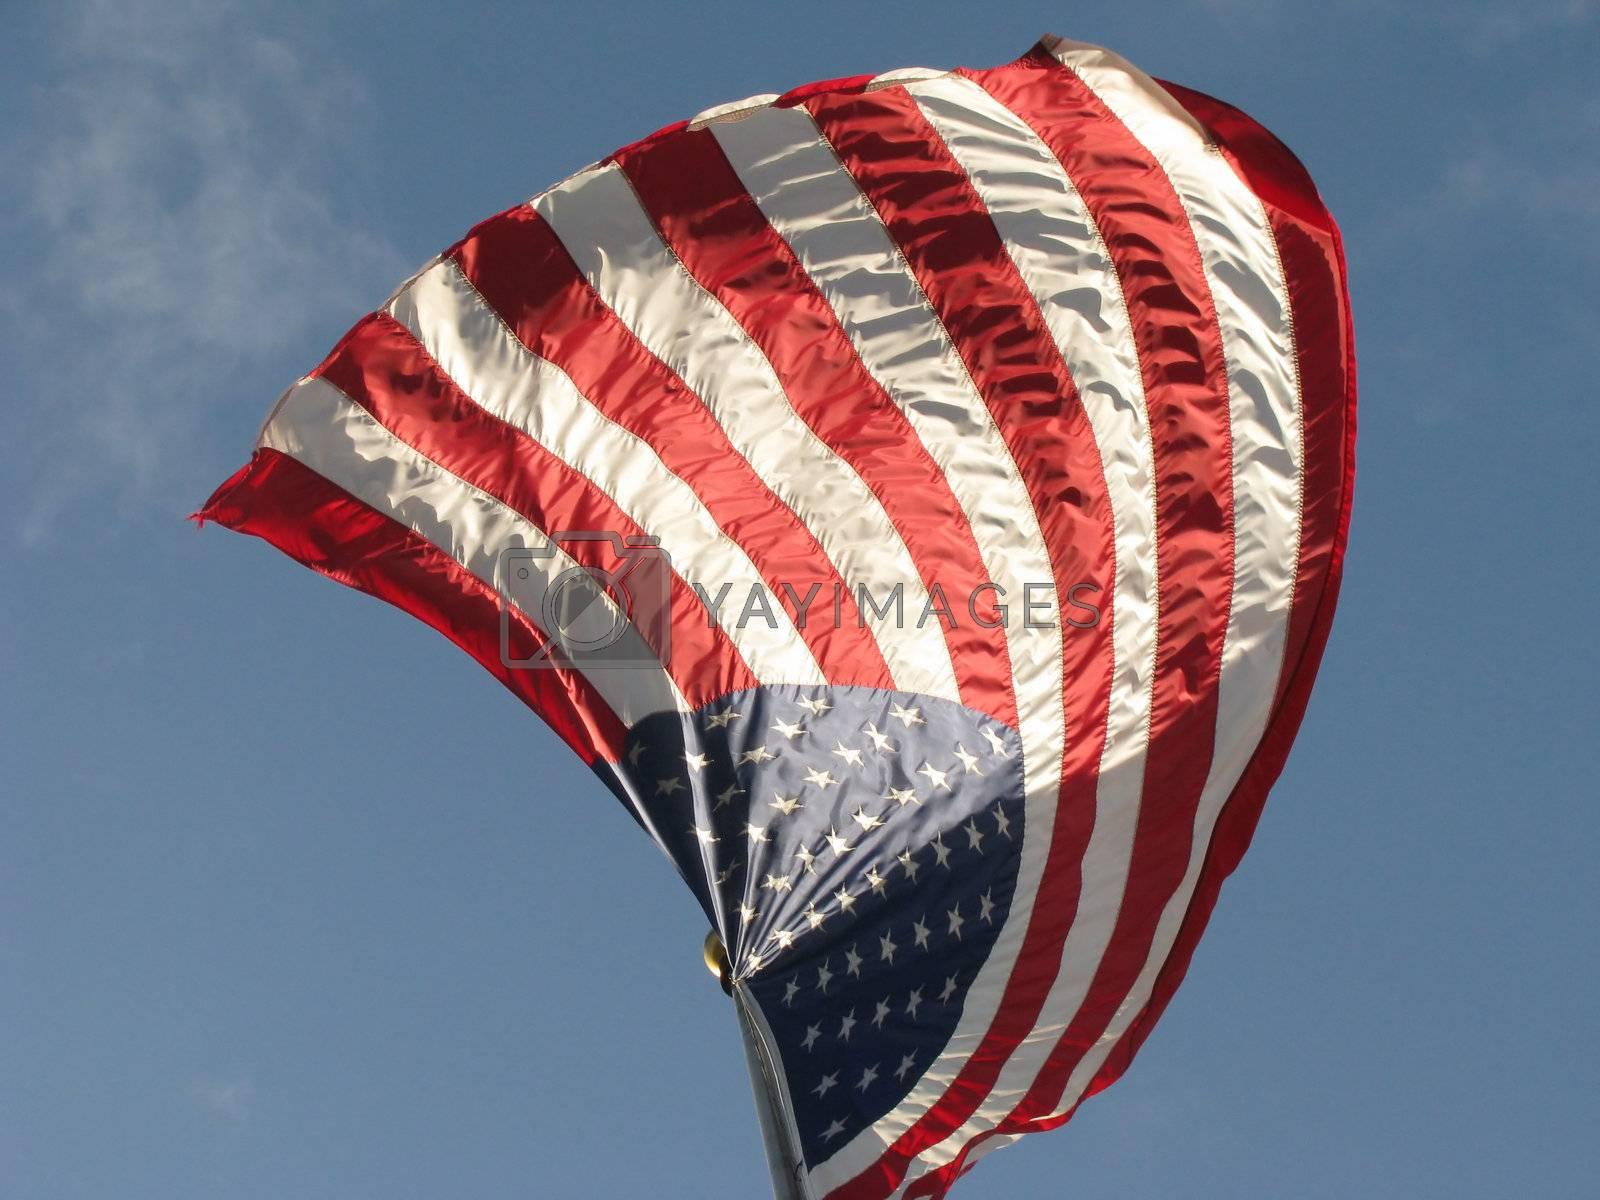 American Flag v4 by mwp1969